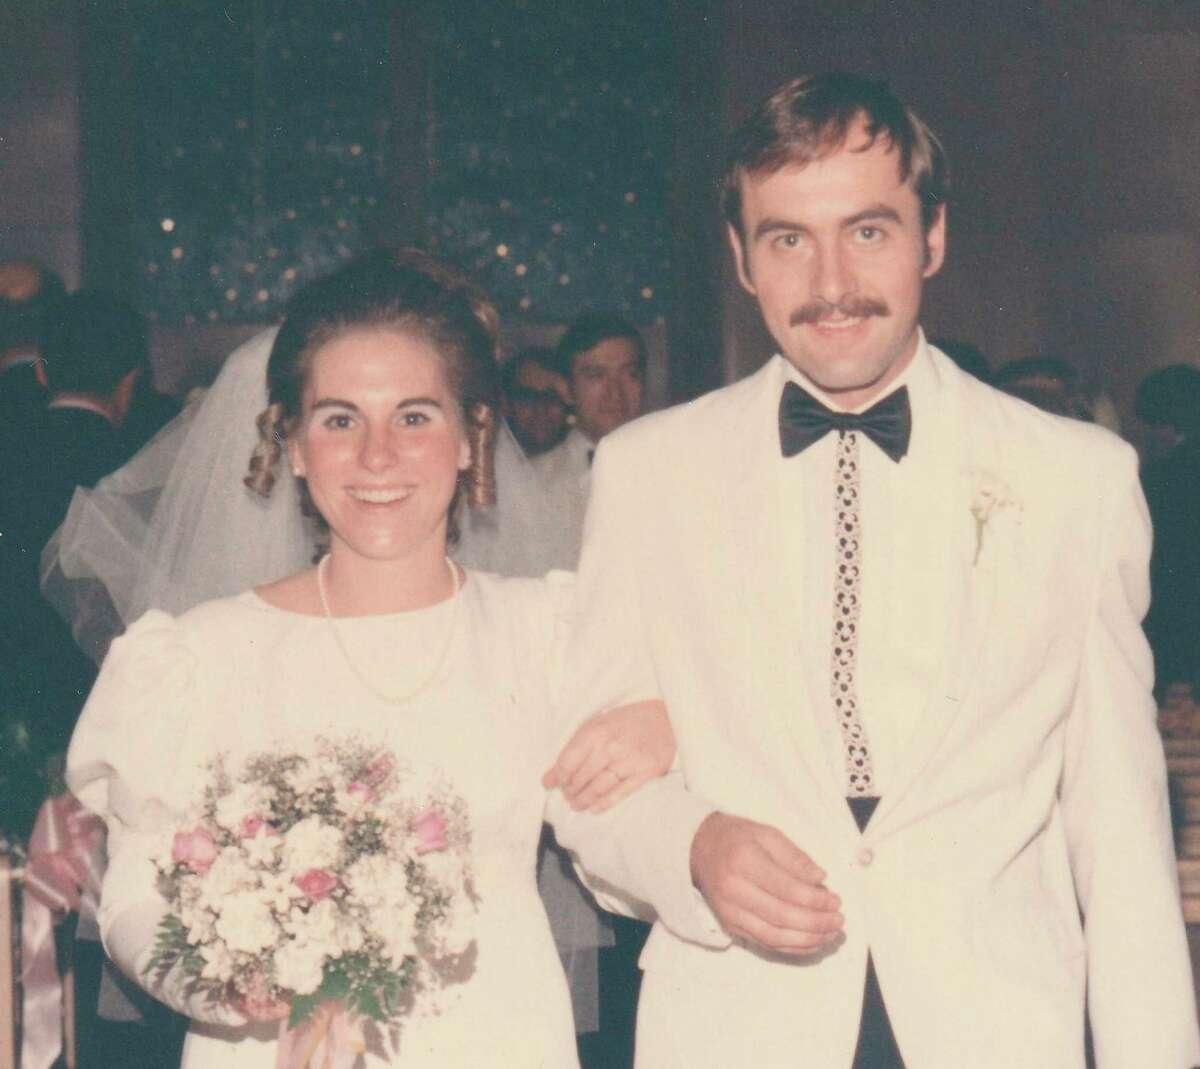 Susan and Gary Rademacher in 1971